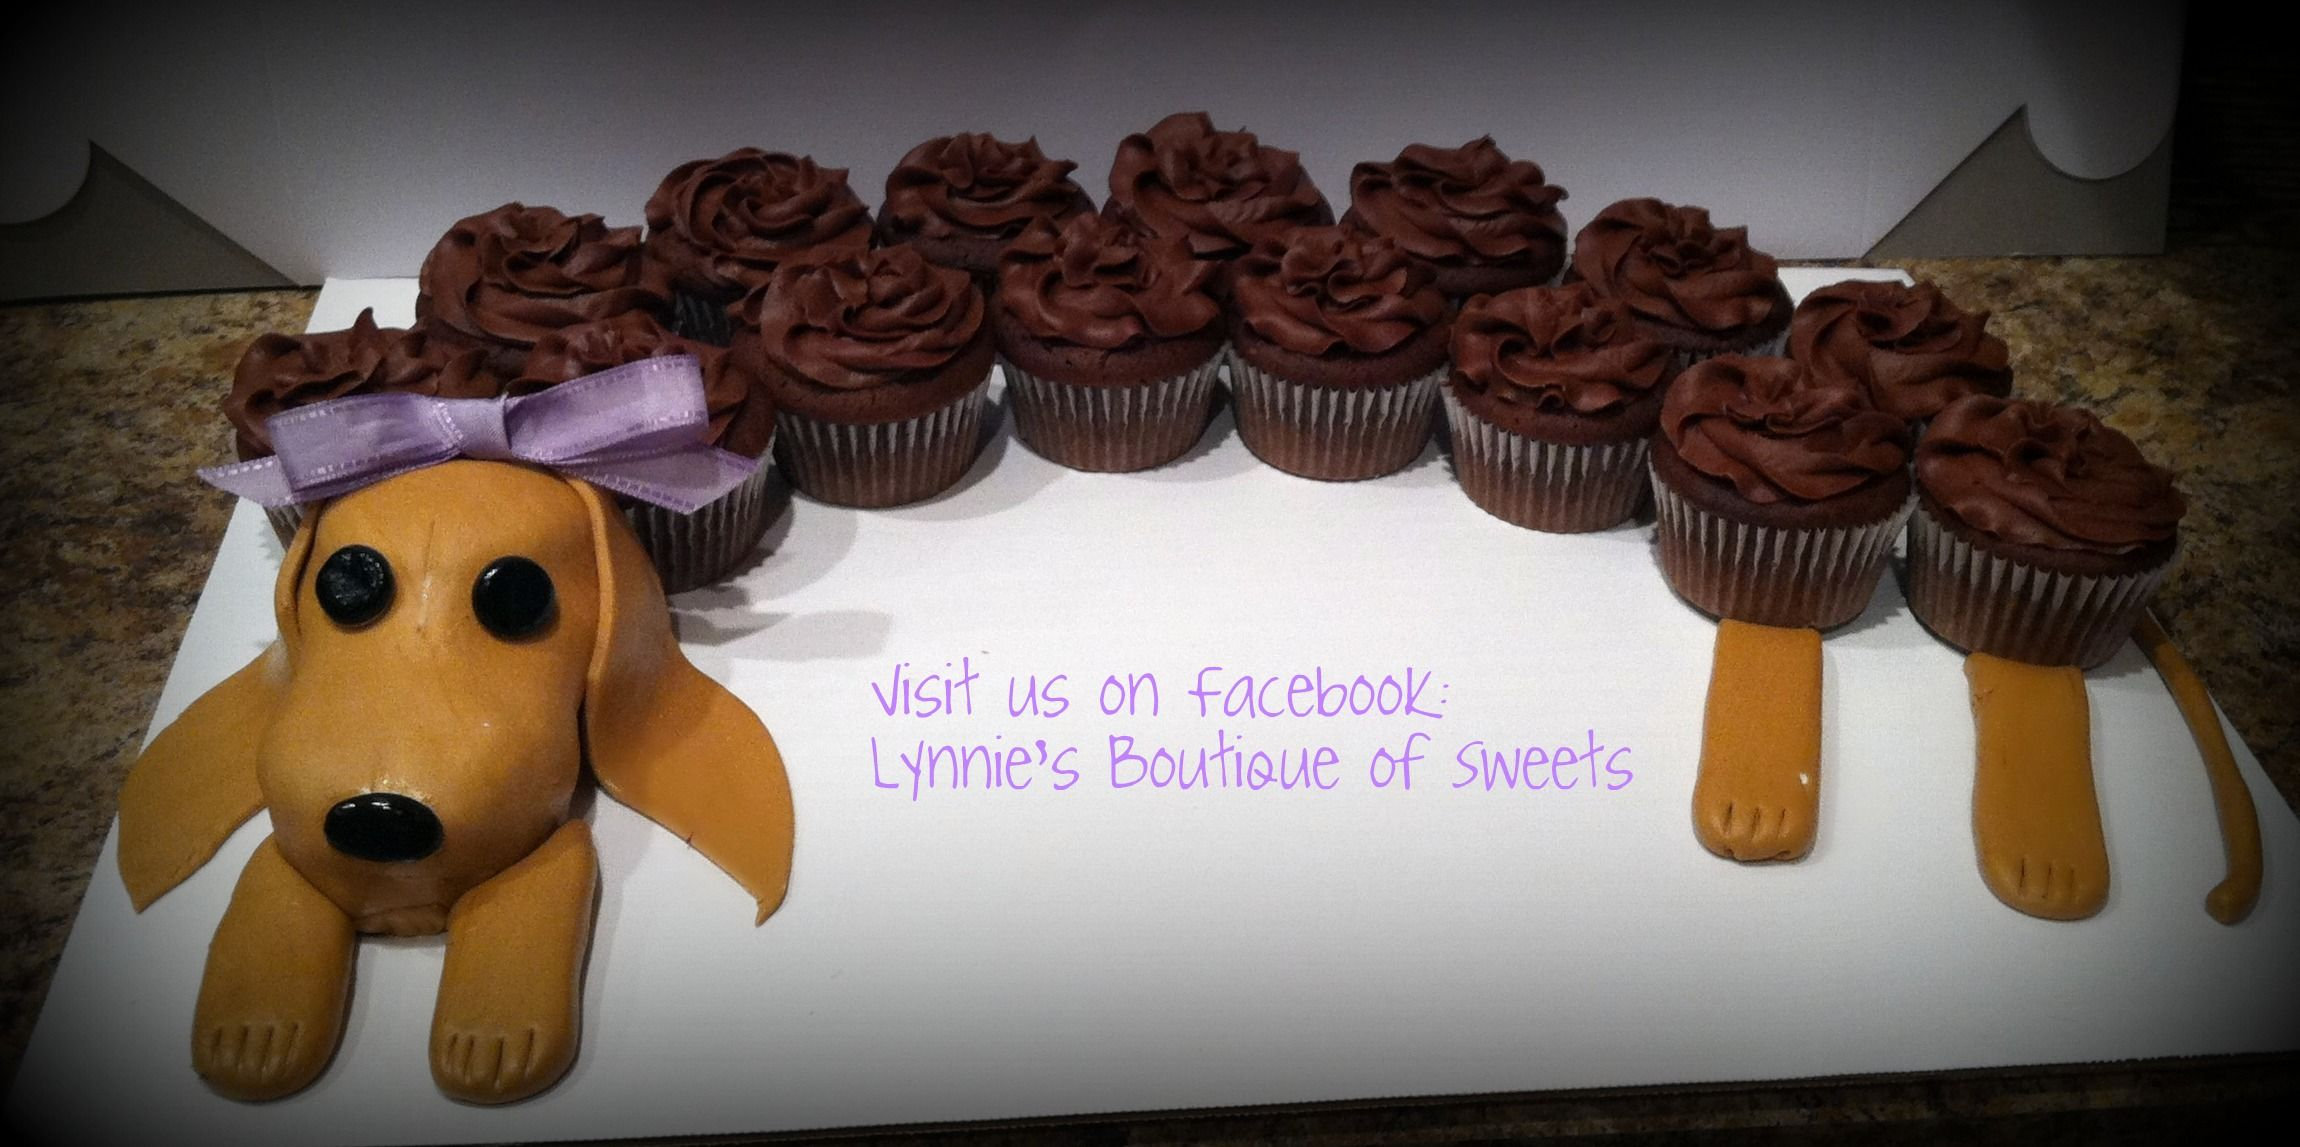 Dachshund Cupcake Cake With Images Dachshund Cake Cupcake